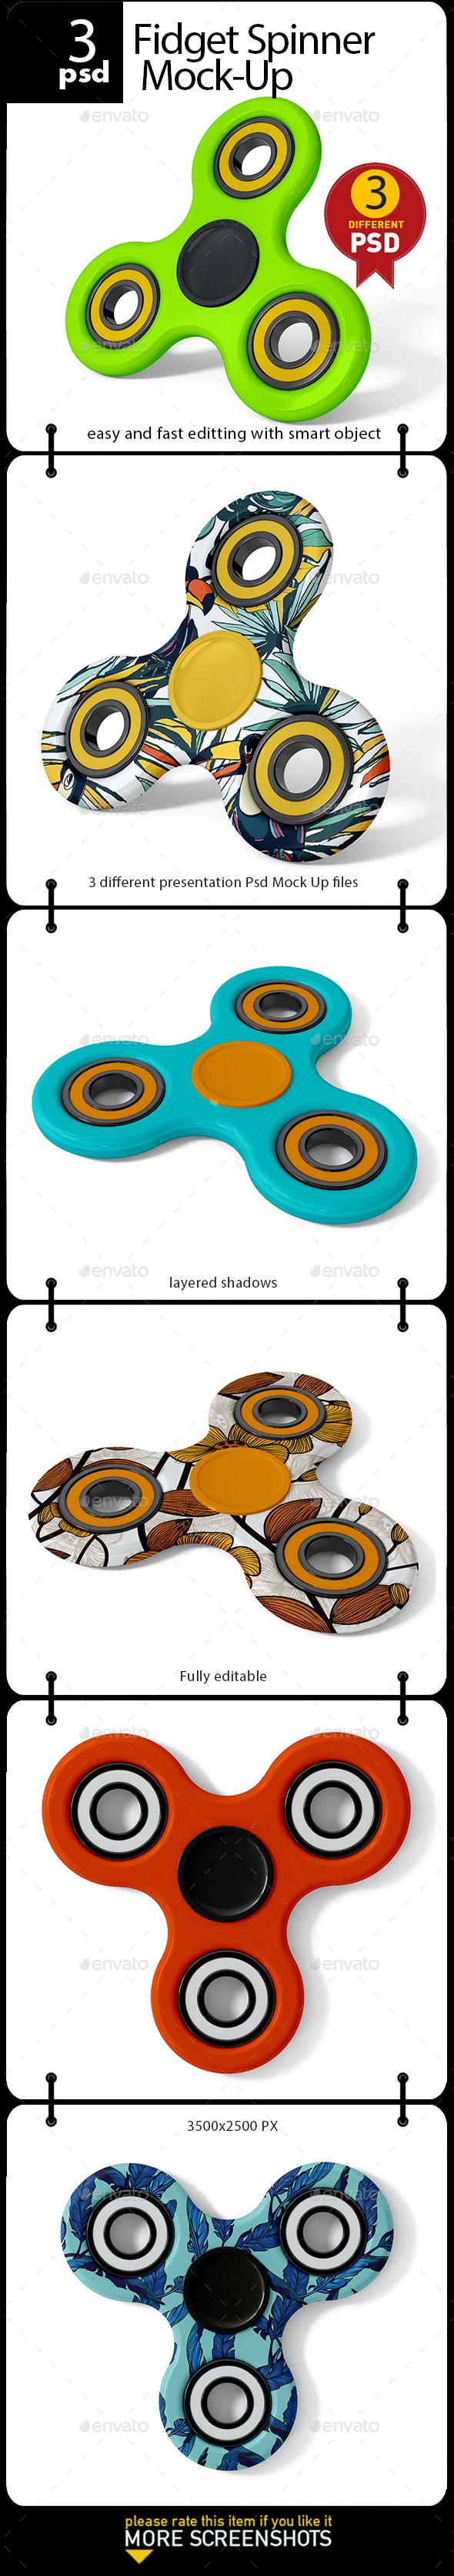 Fidget Spinner Mock-Up - Product Mock-Ups Graphics